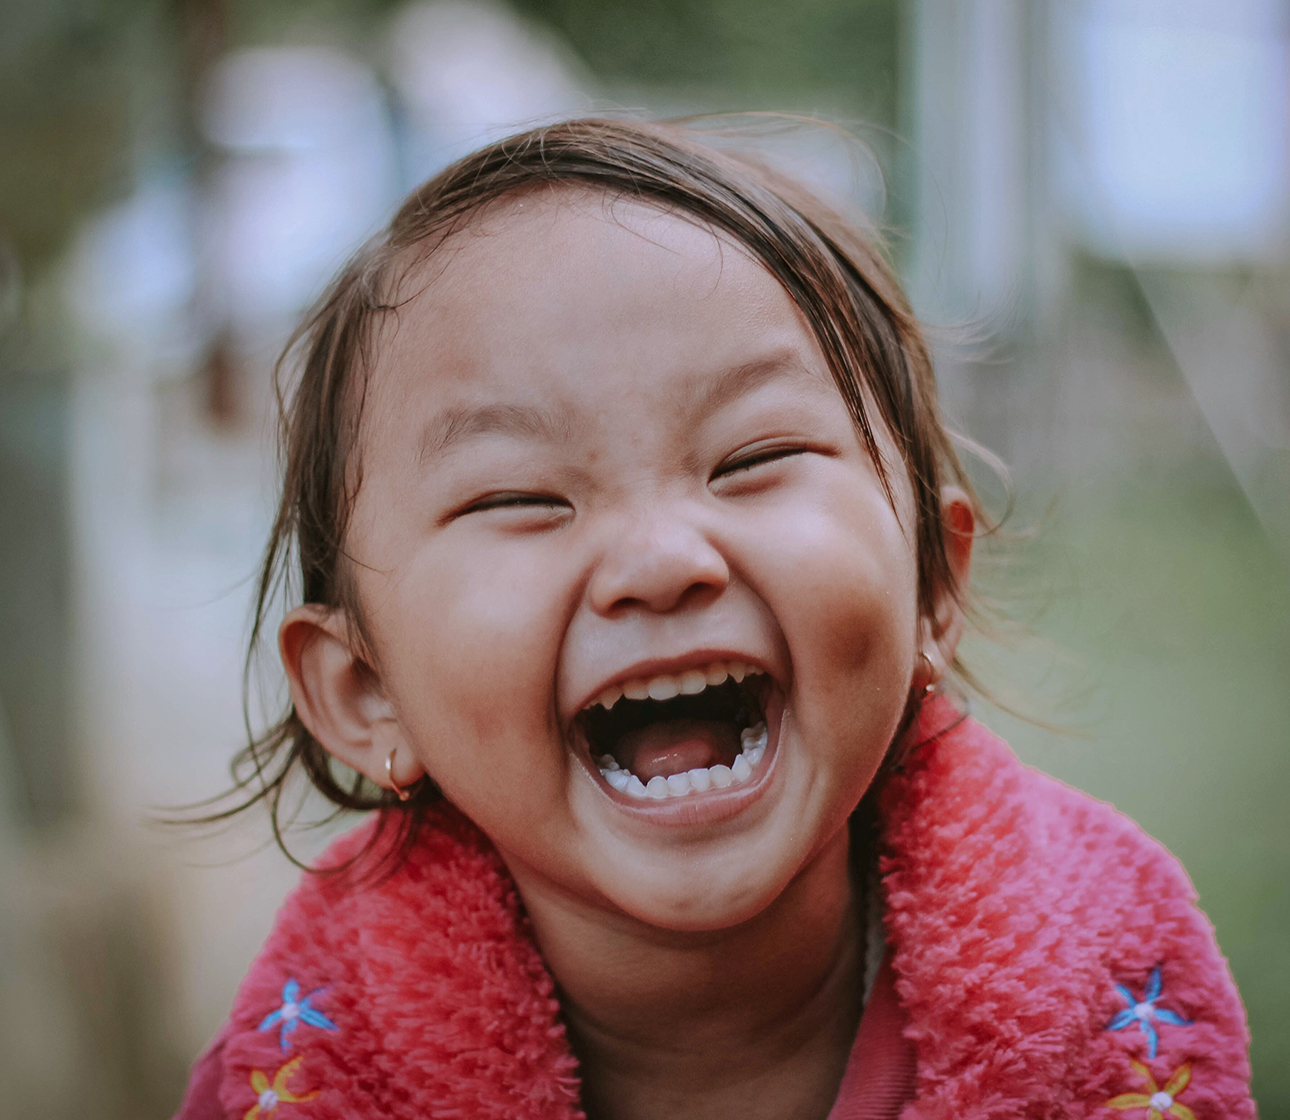 Smiley Dental & Orthodontics - We provide comprehensive pediatric dental care in San Antonio. Contact us today!